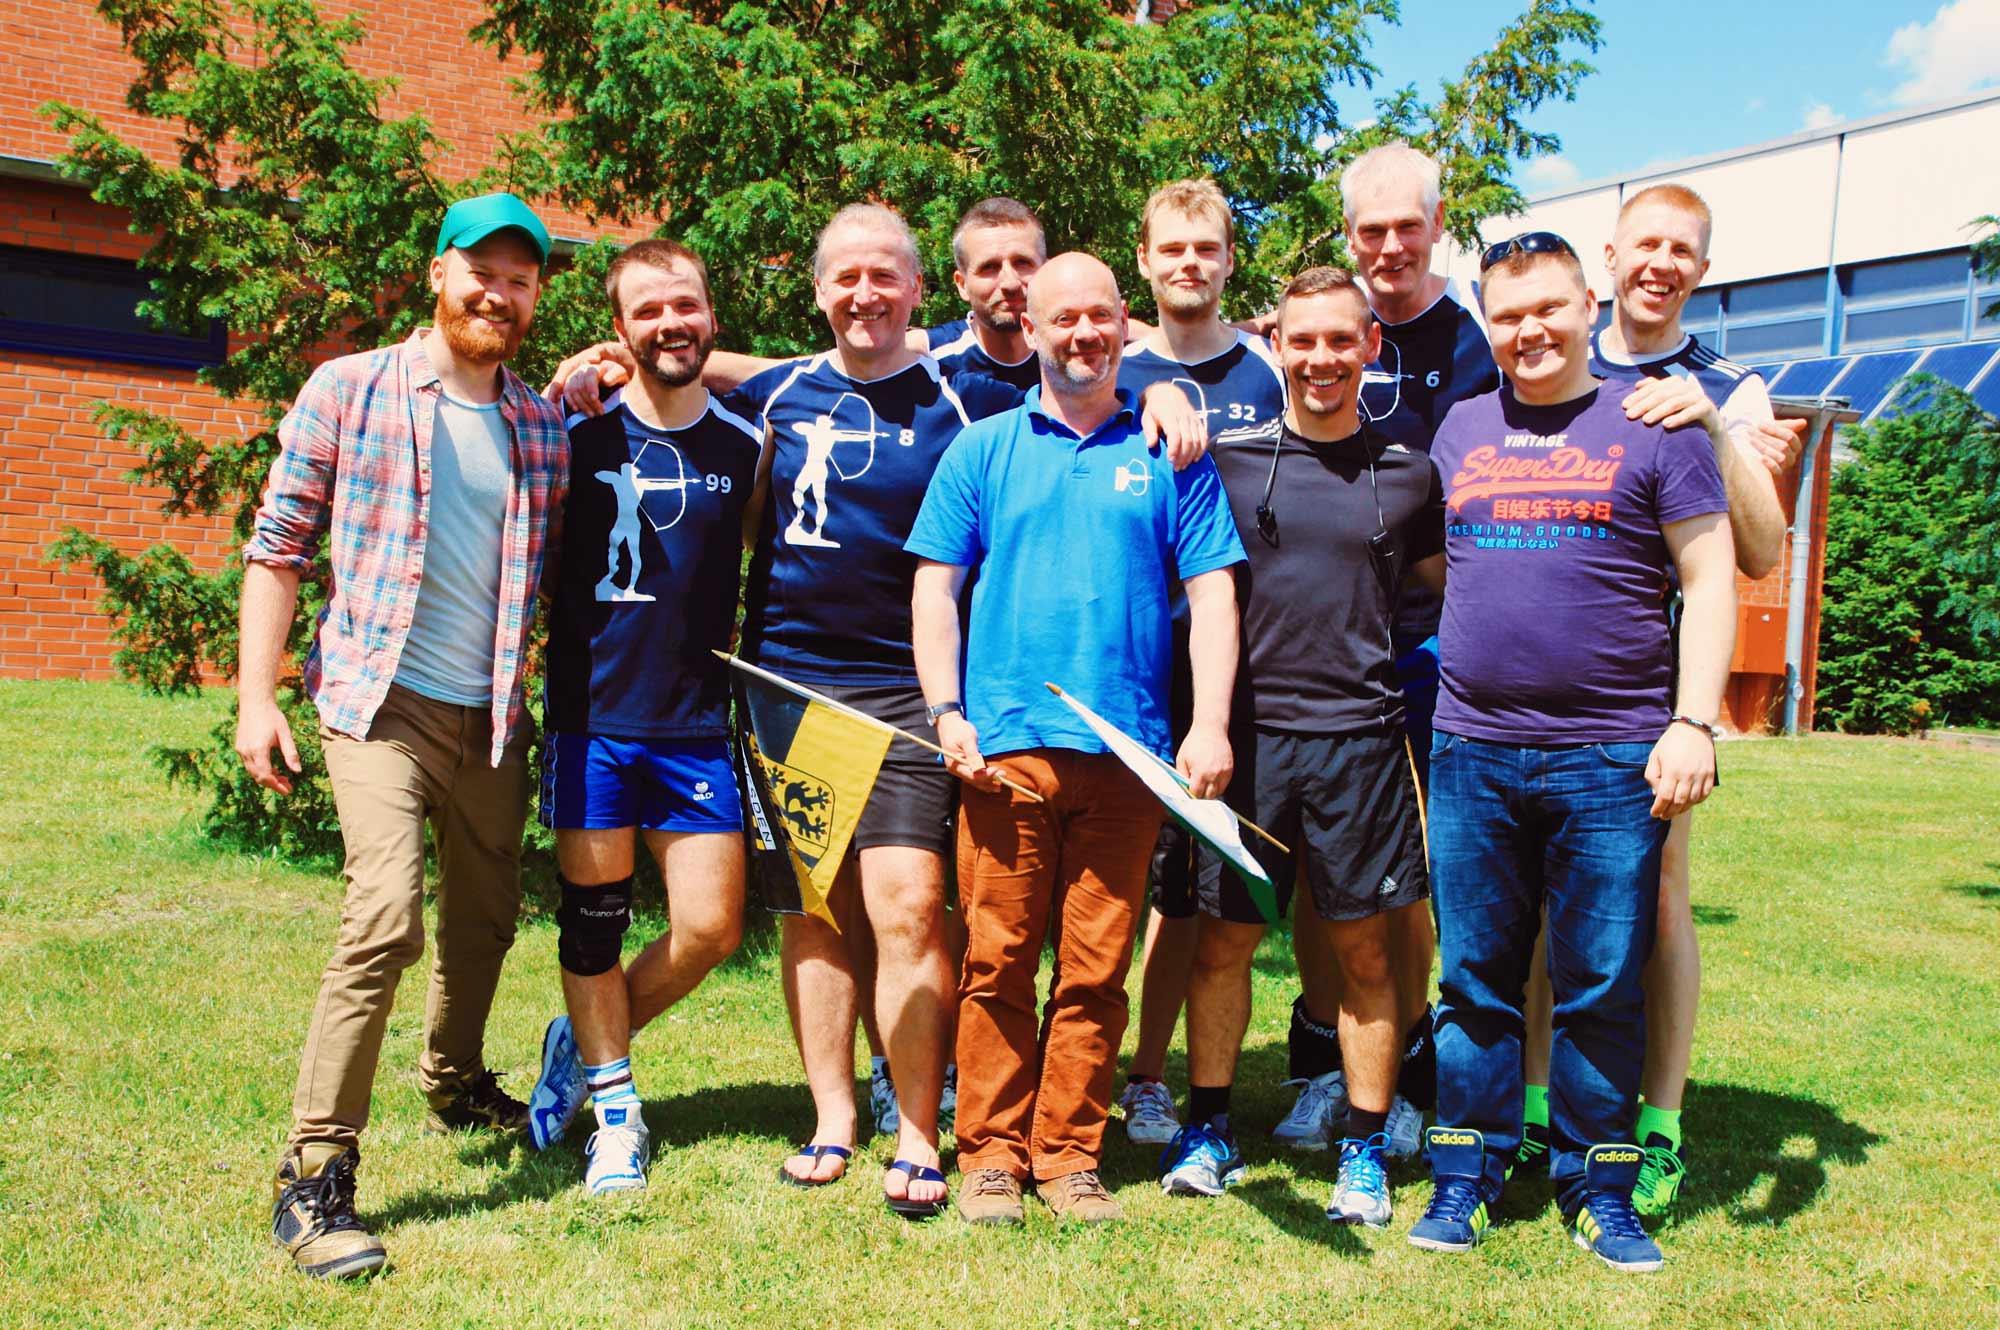 Gay Travel Berlin Goldelsen-Cup Volleyball Tournament © CoupleofMen.com